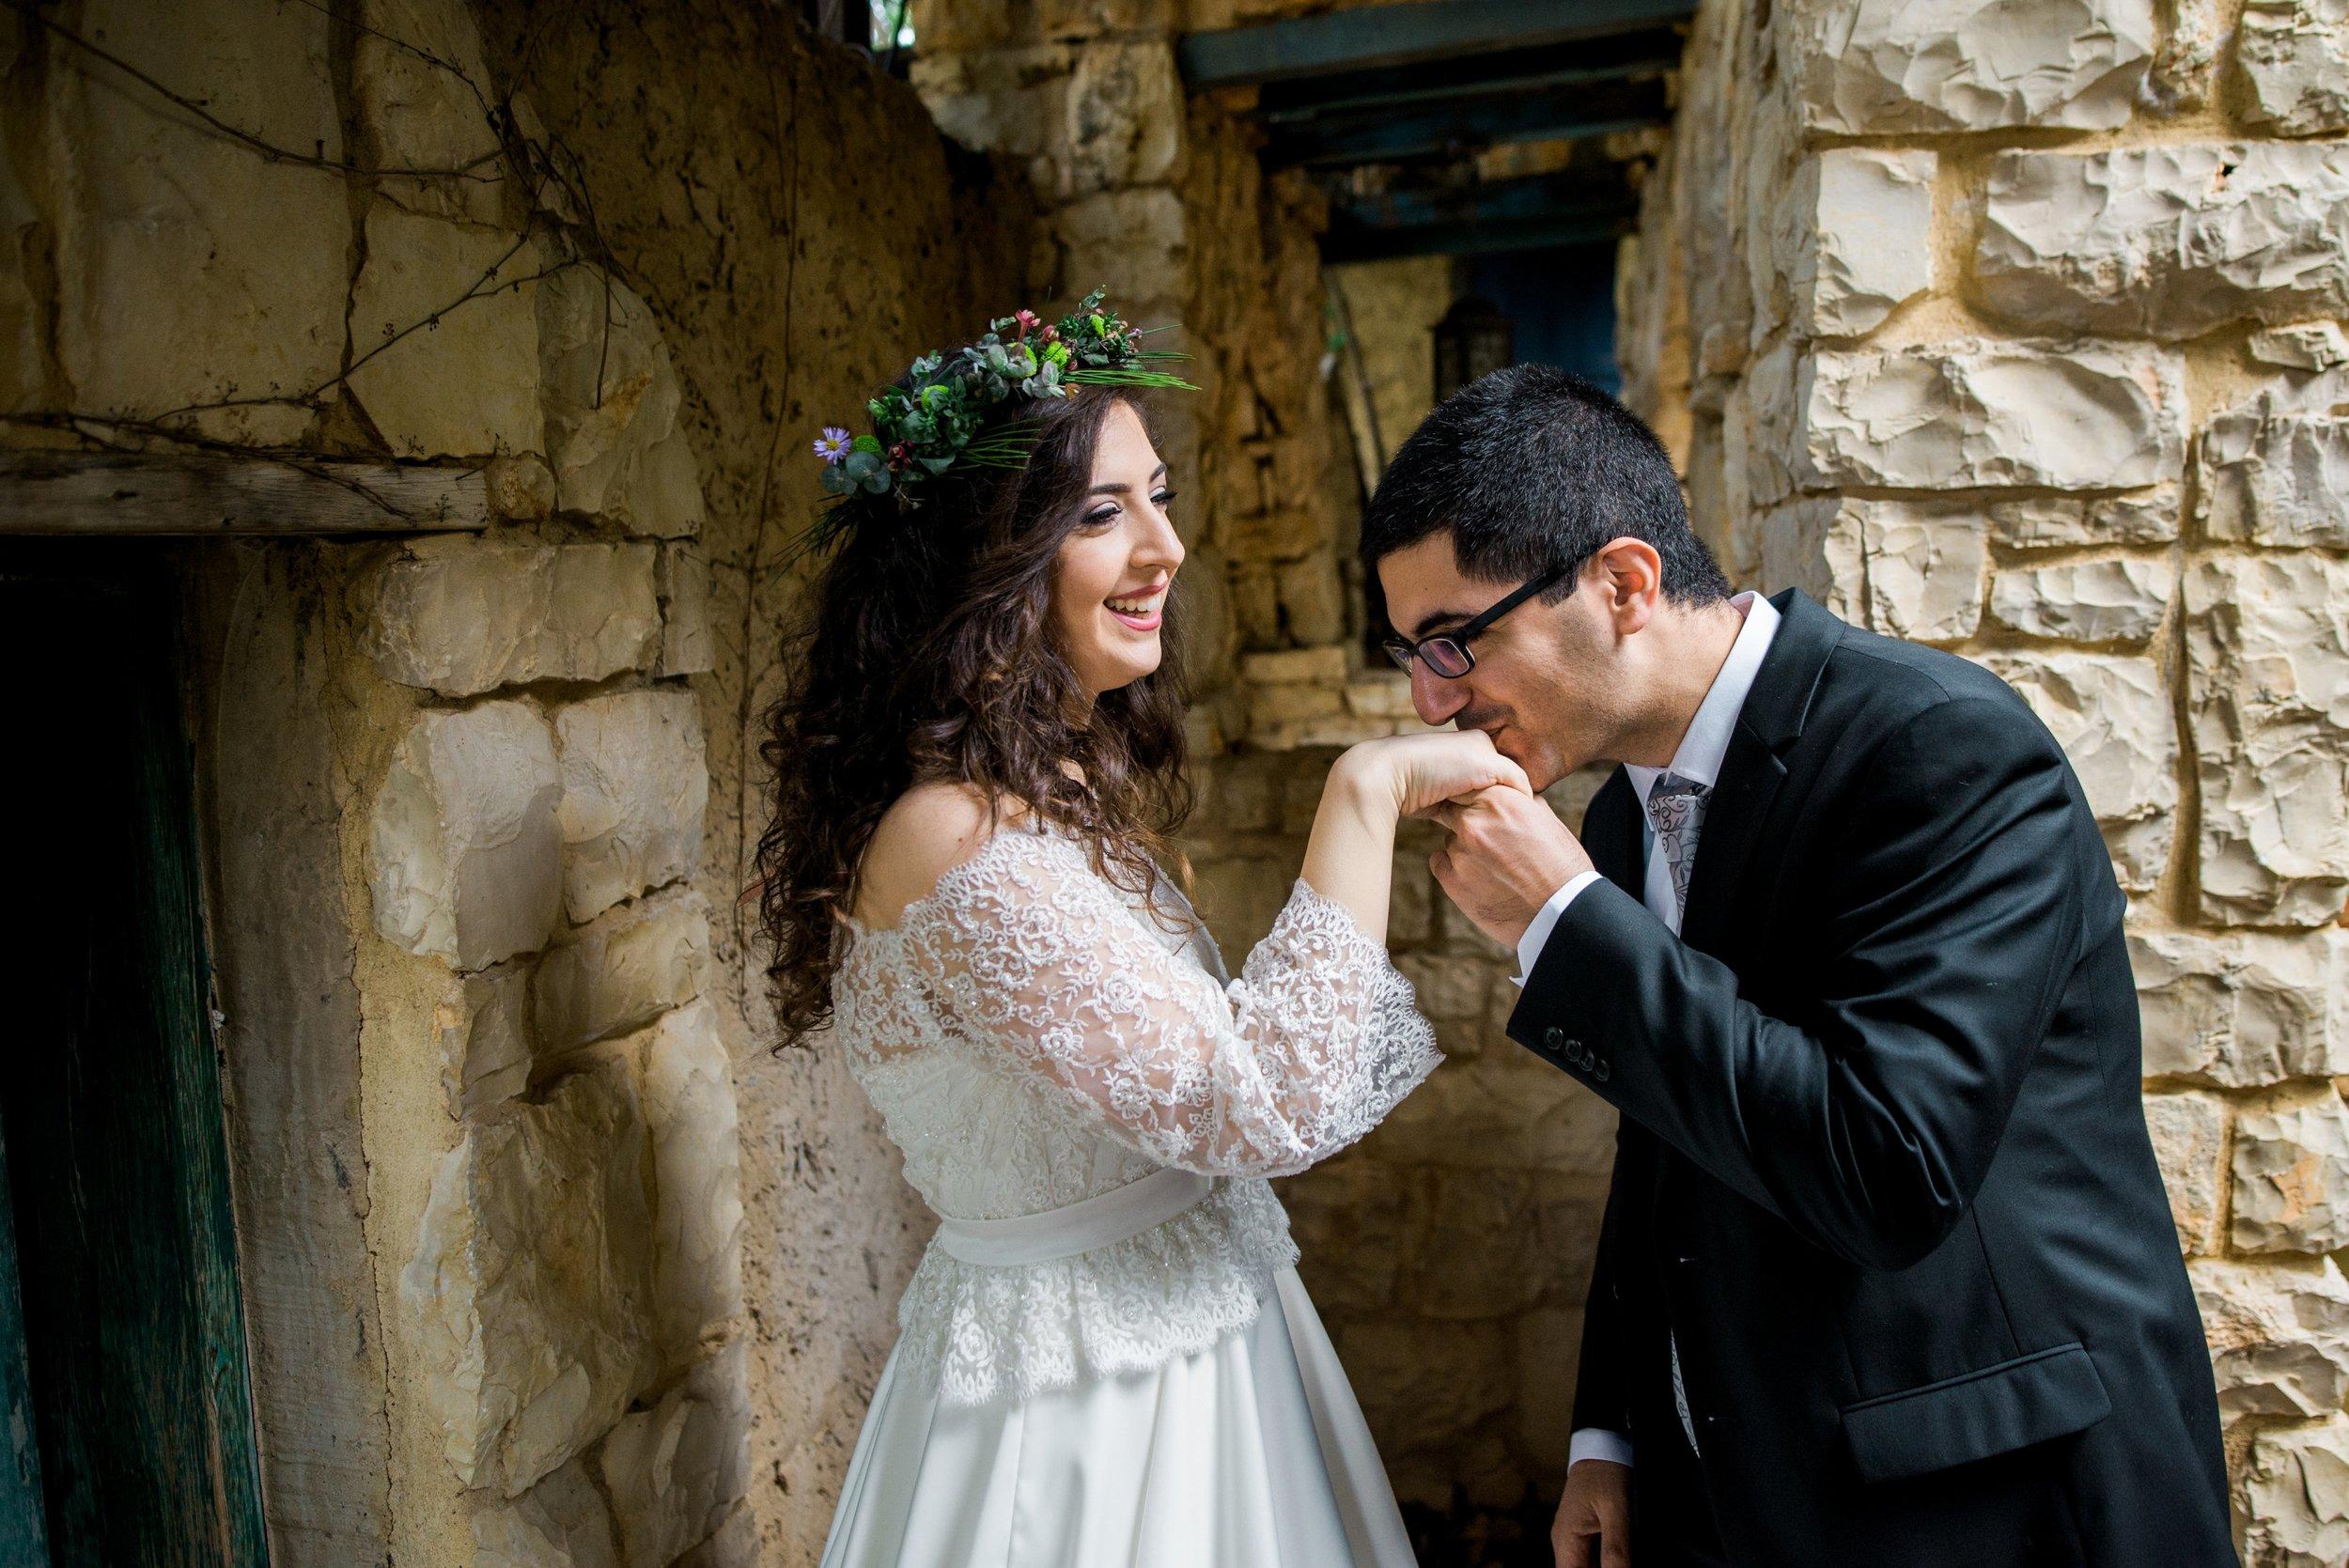 israel-garden-wedding-portraits-session-kate-giryes-photography--9_WEB.jpg